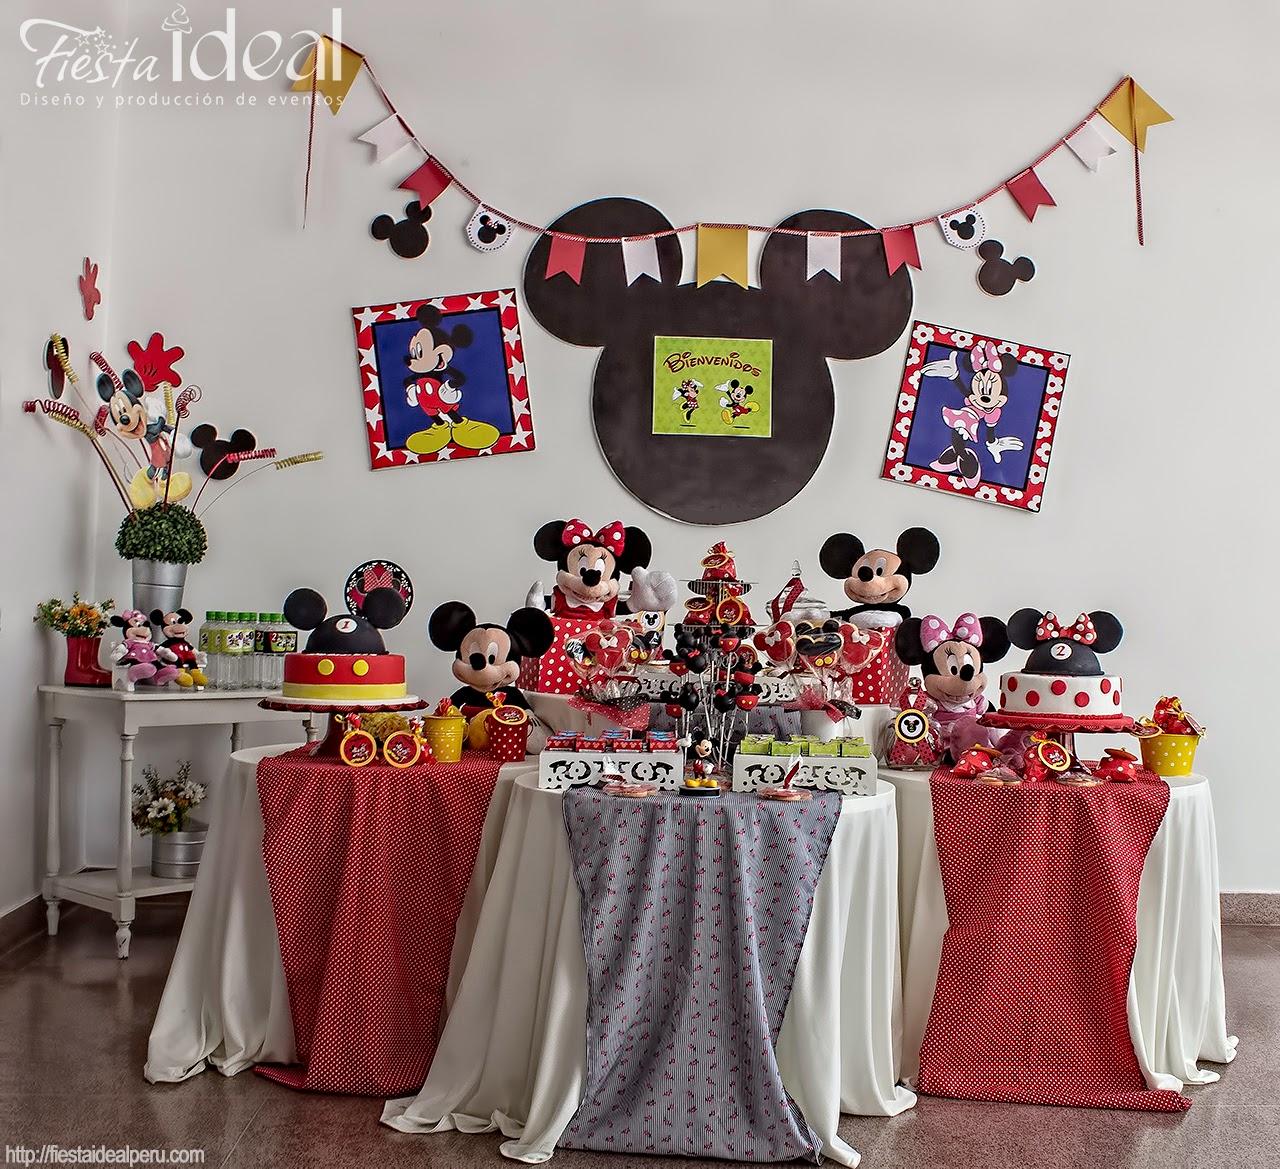 Fiesta Ideal Peru Decoracion Fiesta Cumpleanos Mickey Y Minnie